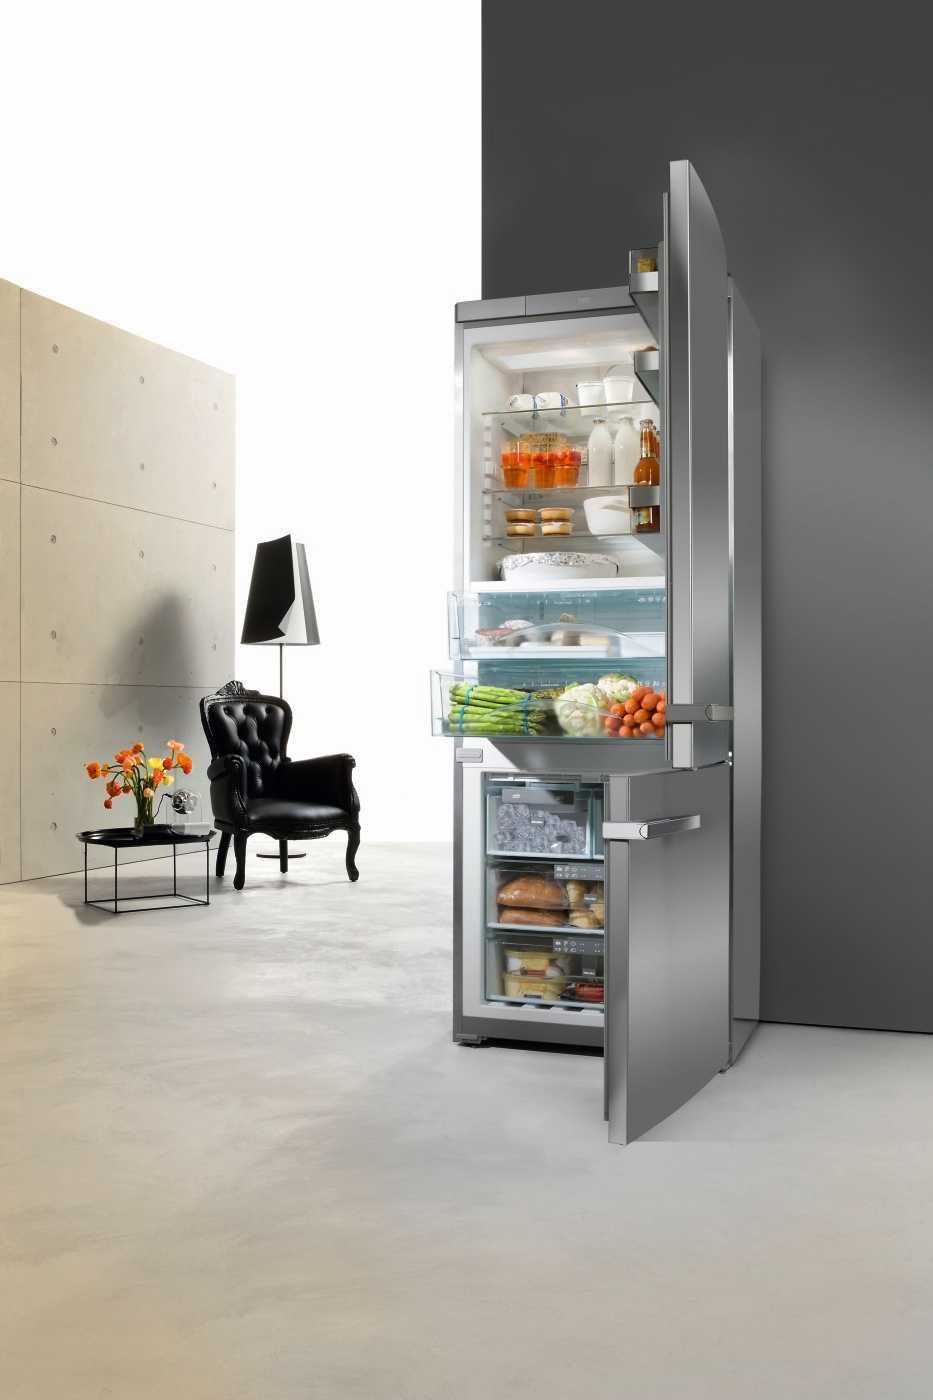 Freestanding Ref-Freezer, KFN 14947 SDE, Miele.jpg